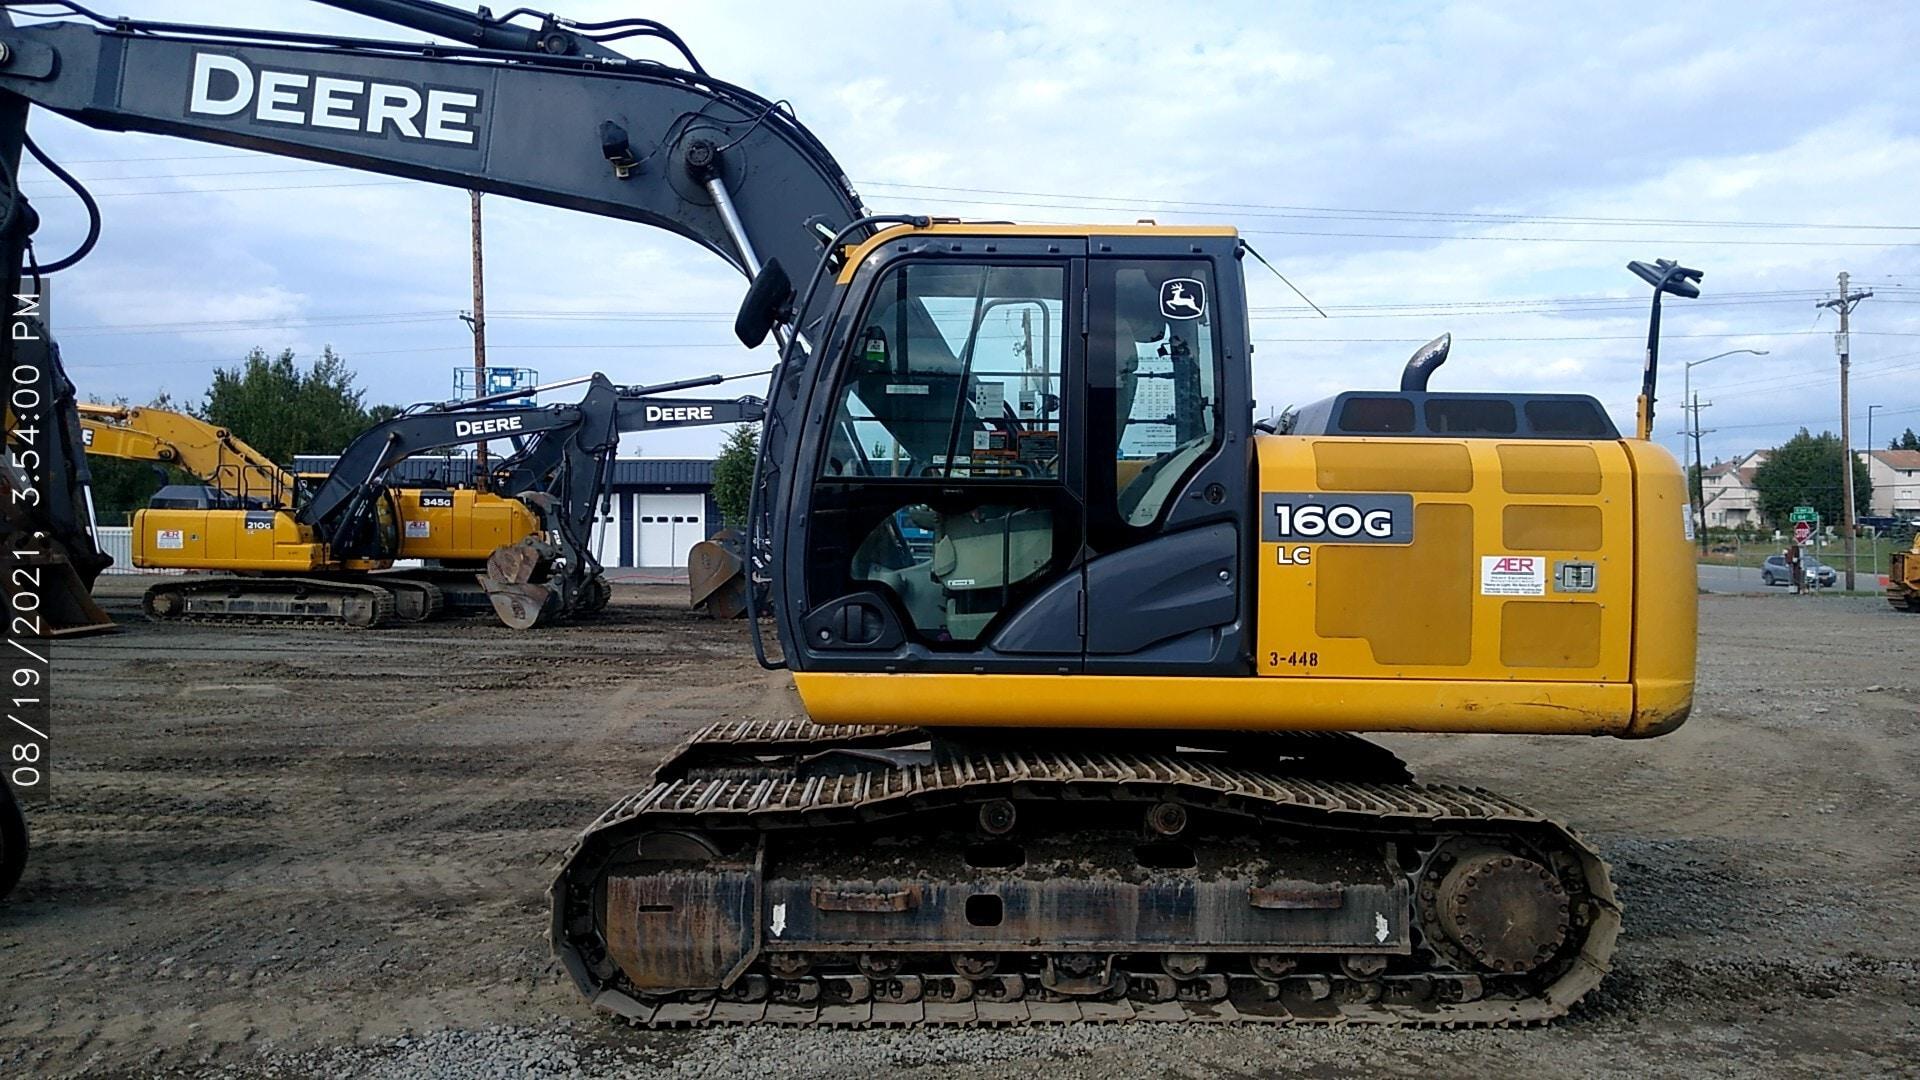 Used, 2014, John Deere Construction, 160G LC, Excavators